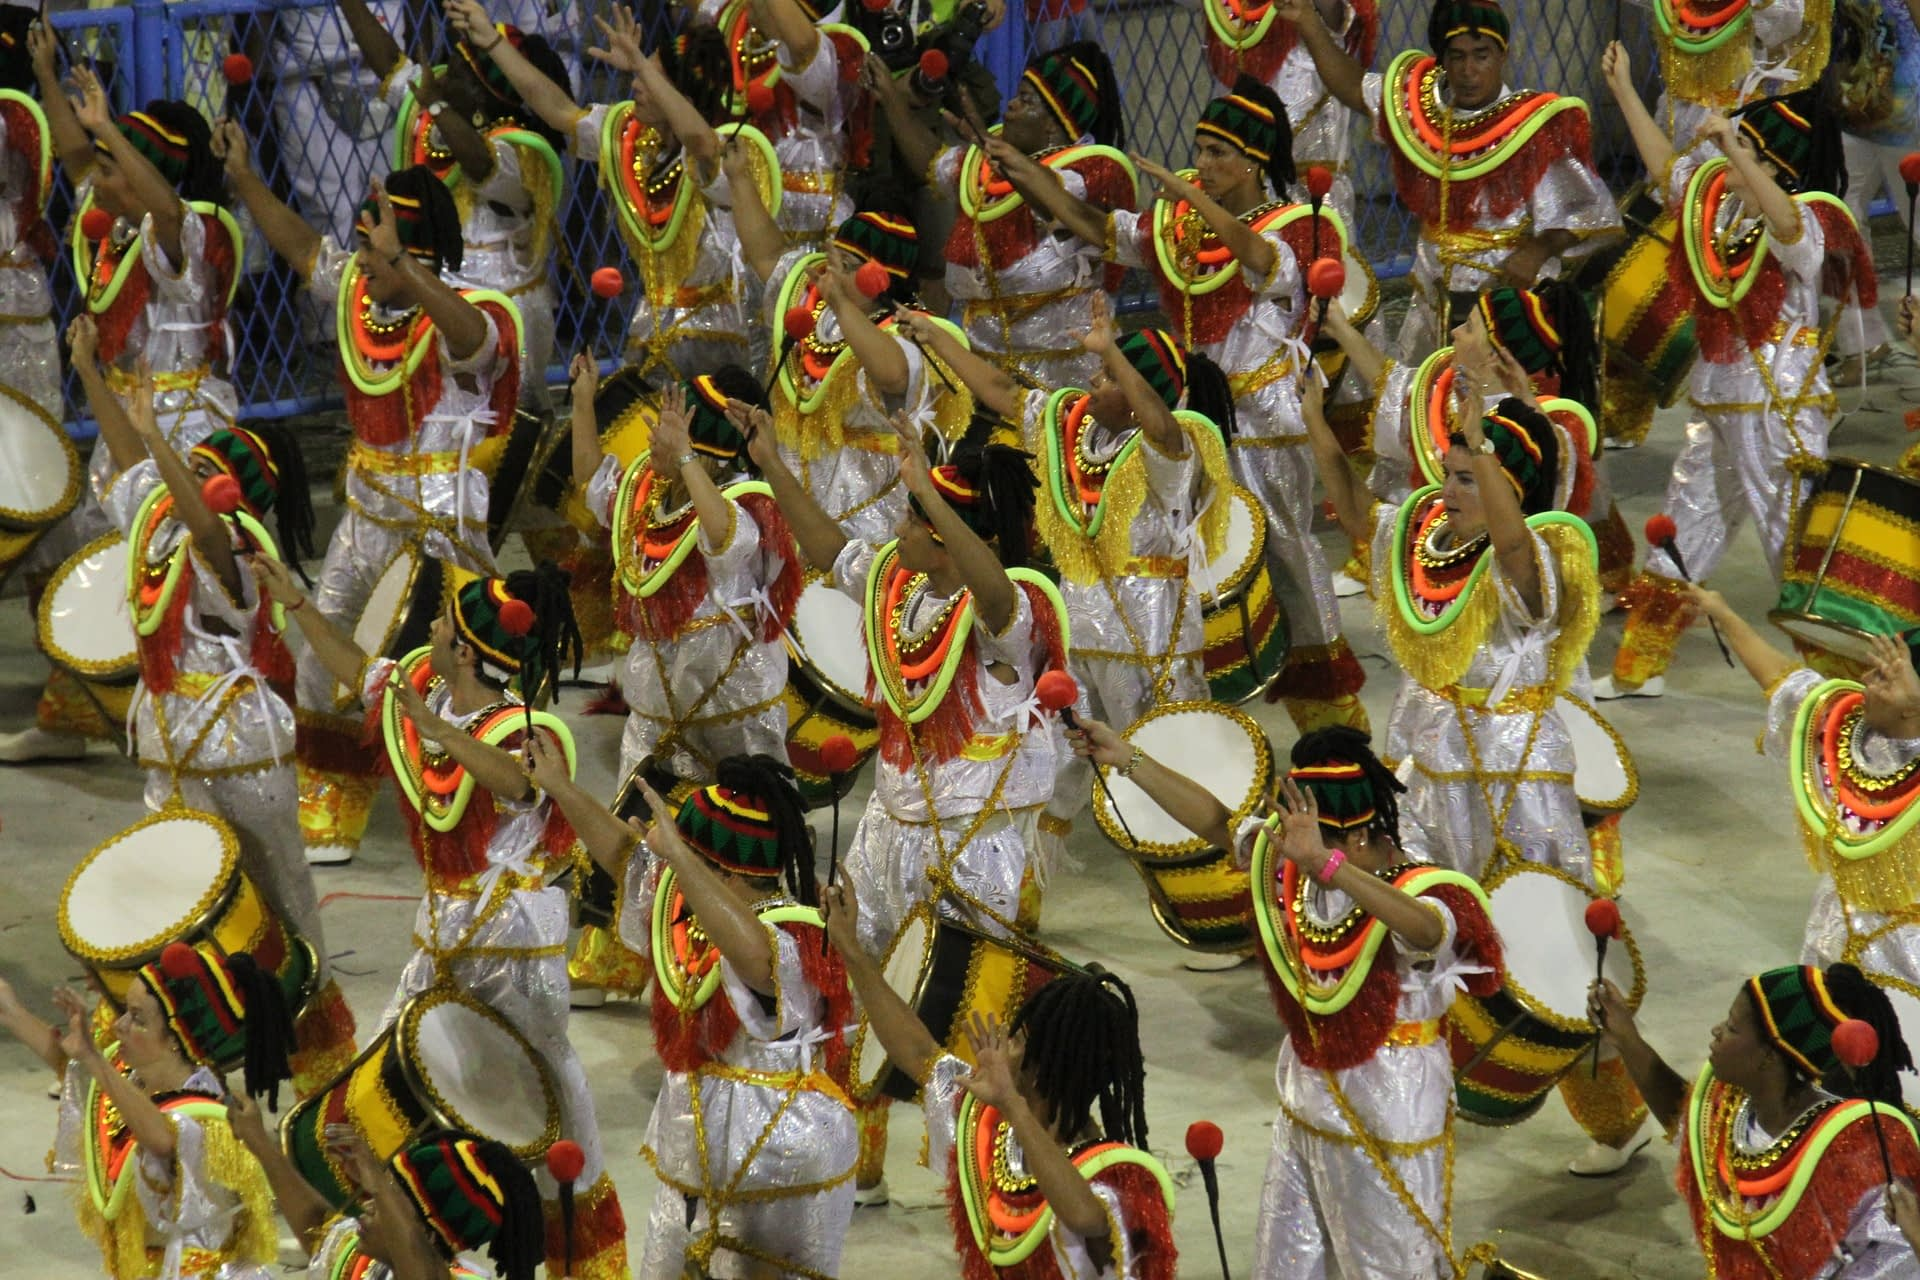 A Complete Guide To Rio Carnival